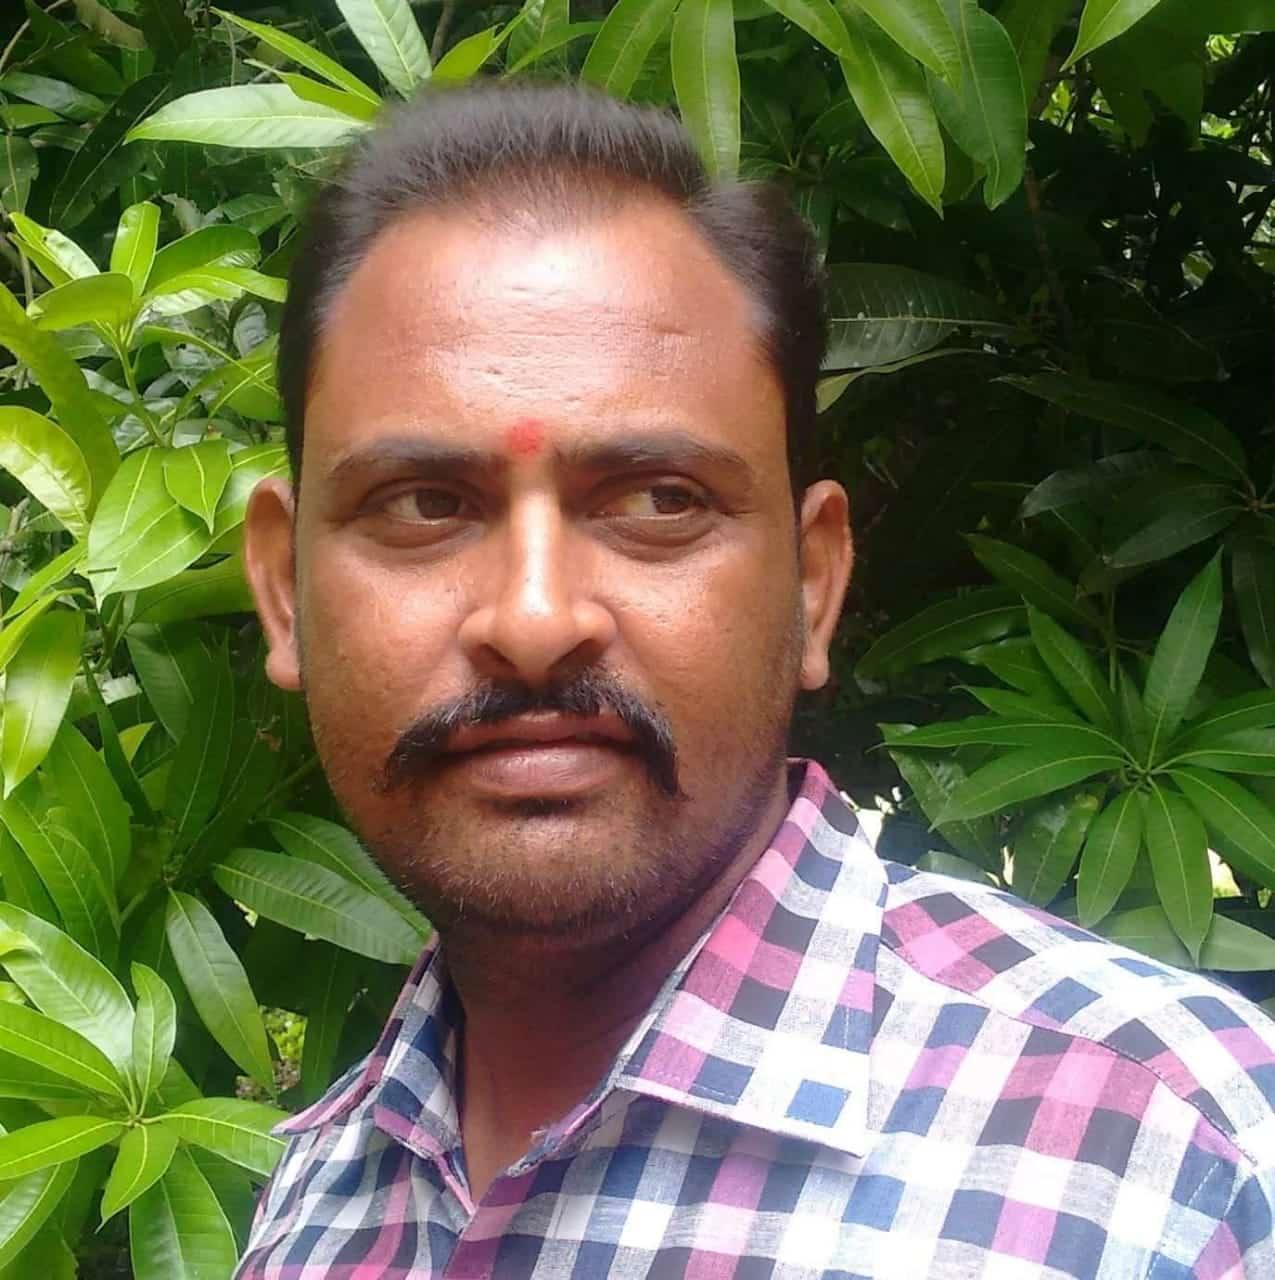 Bhandhela Subhash